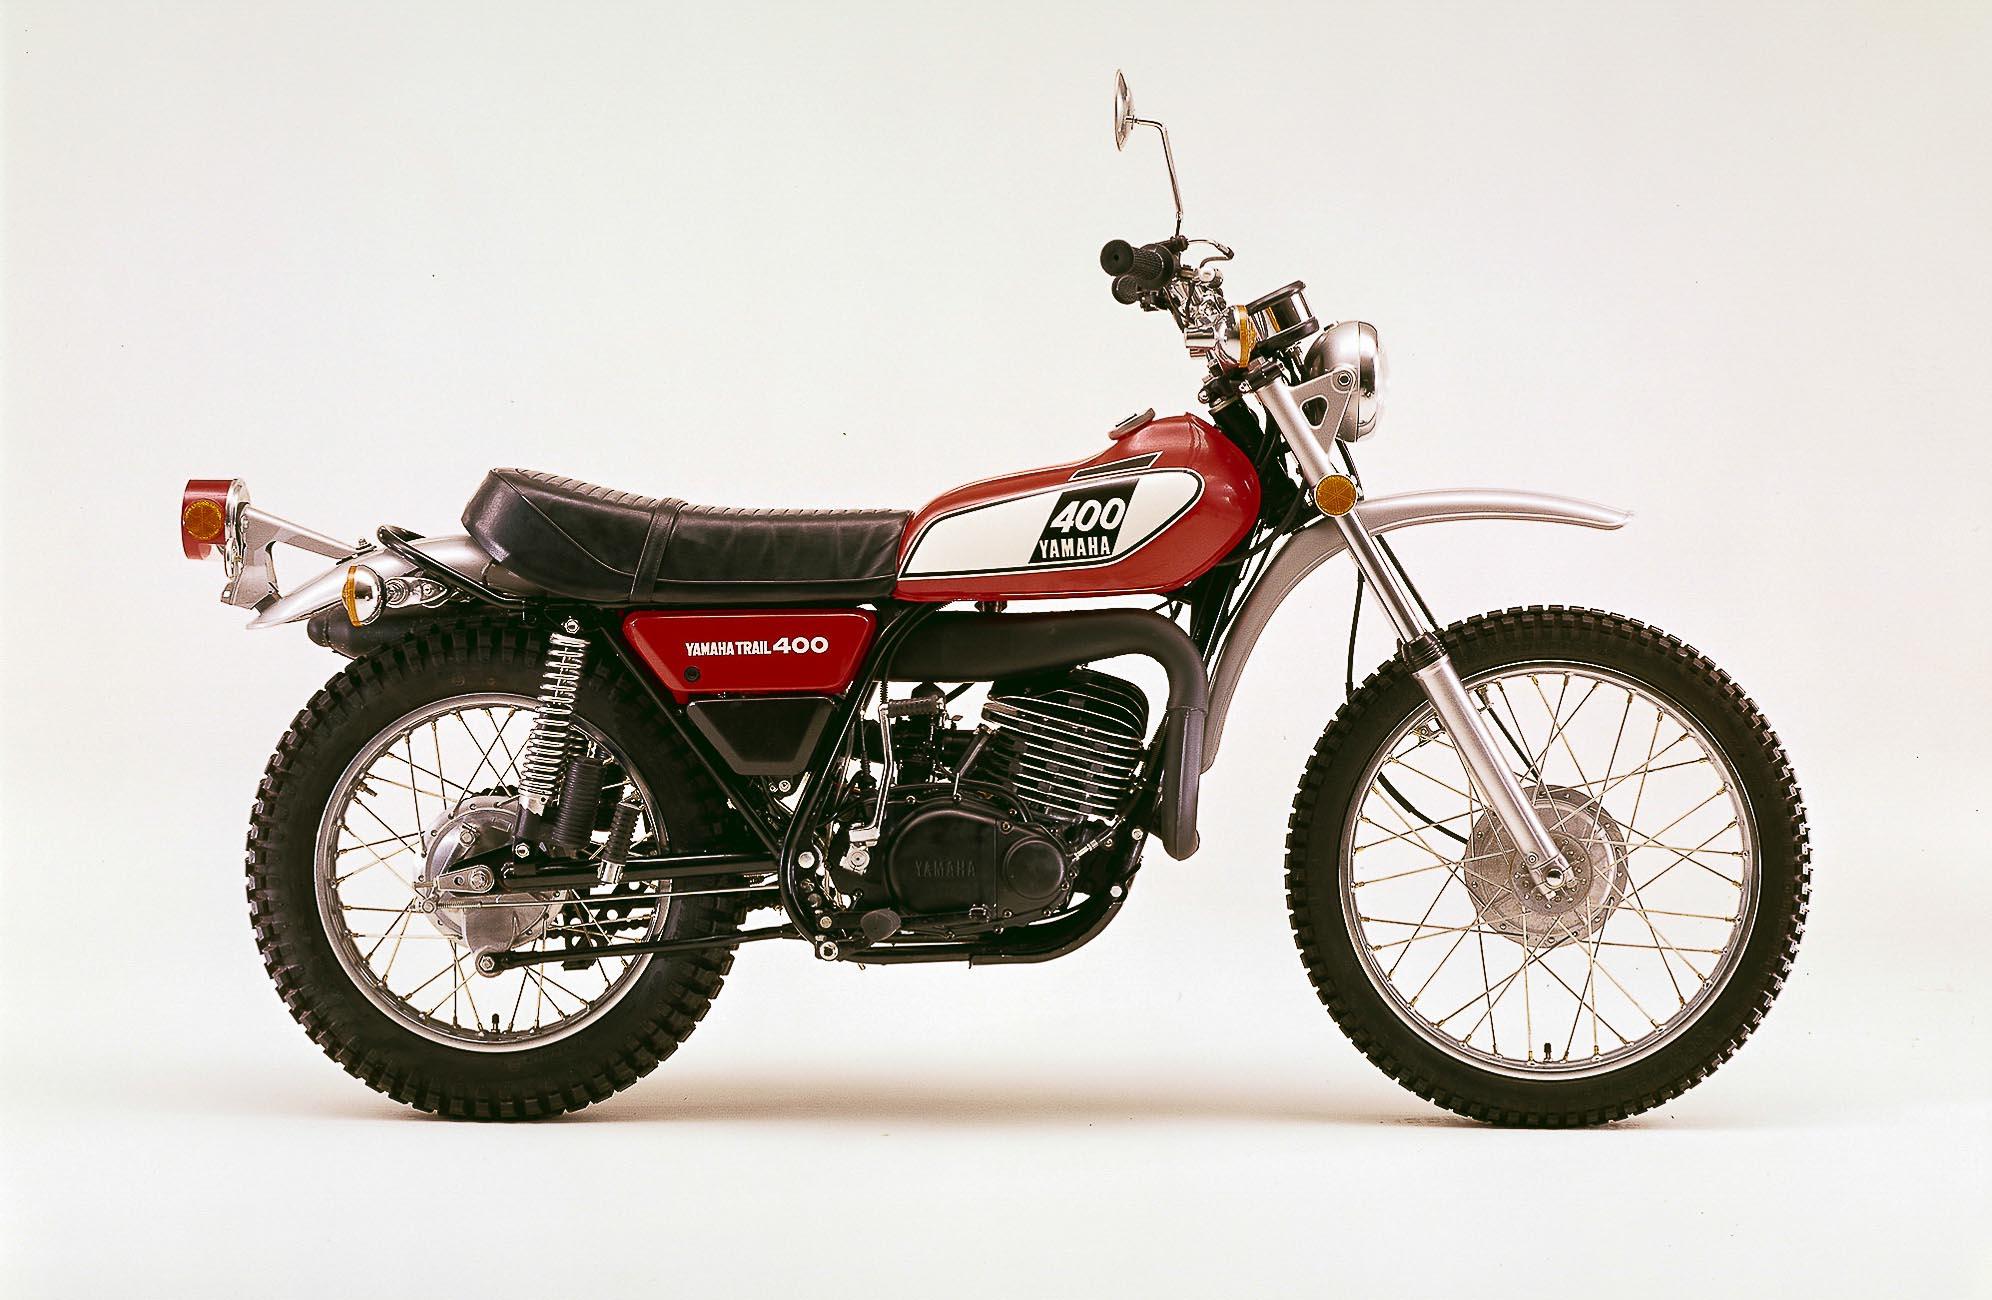 YAMAHA DT 400 (1975 - 1980)